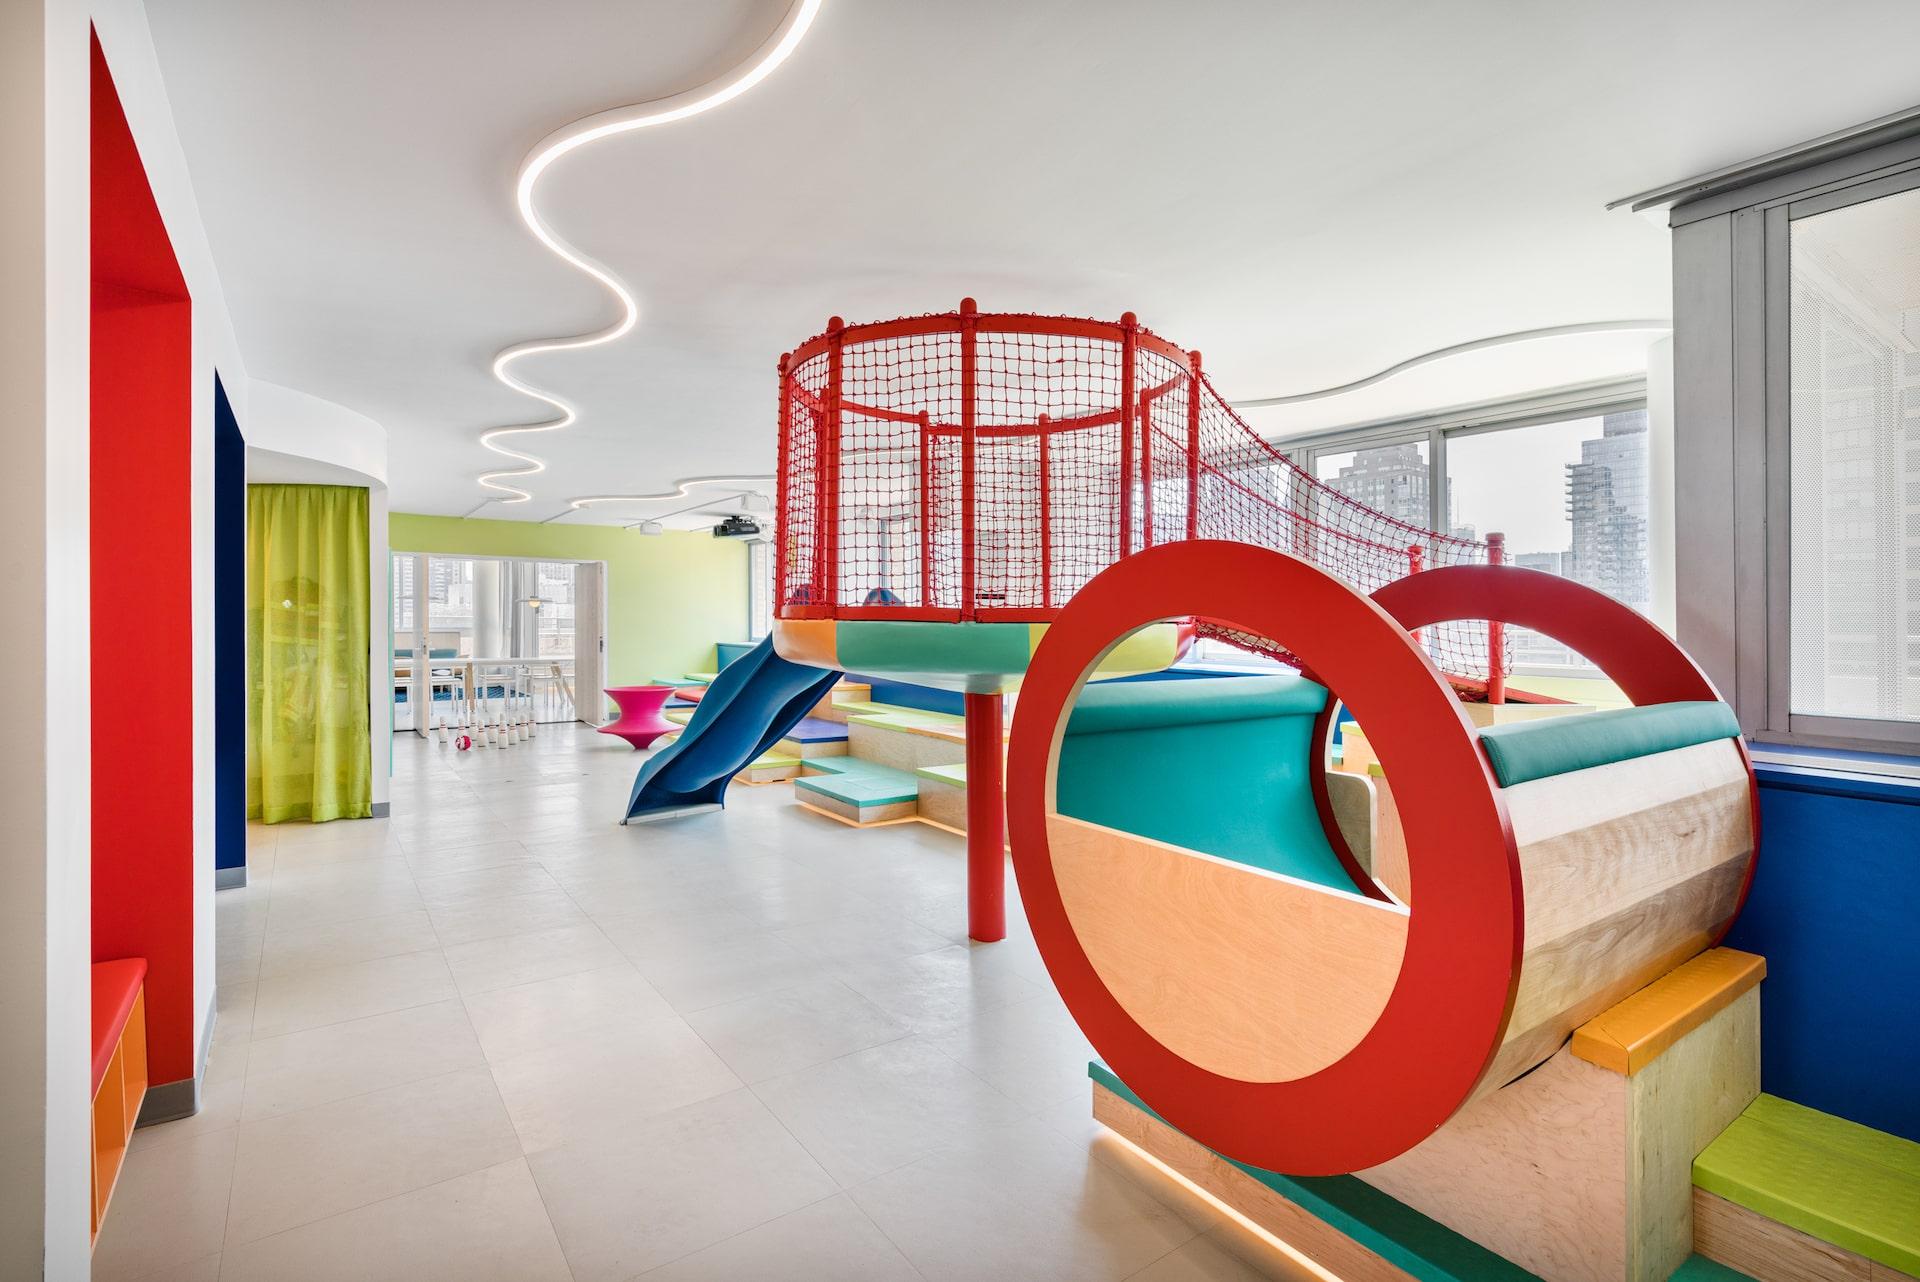 101 West End Avenue Amenities children's playroom